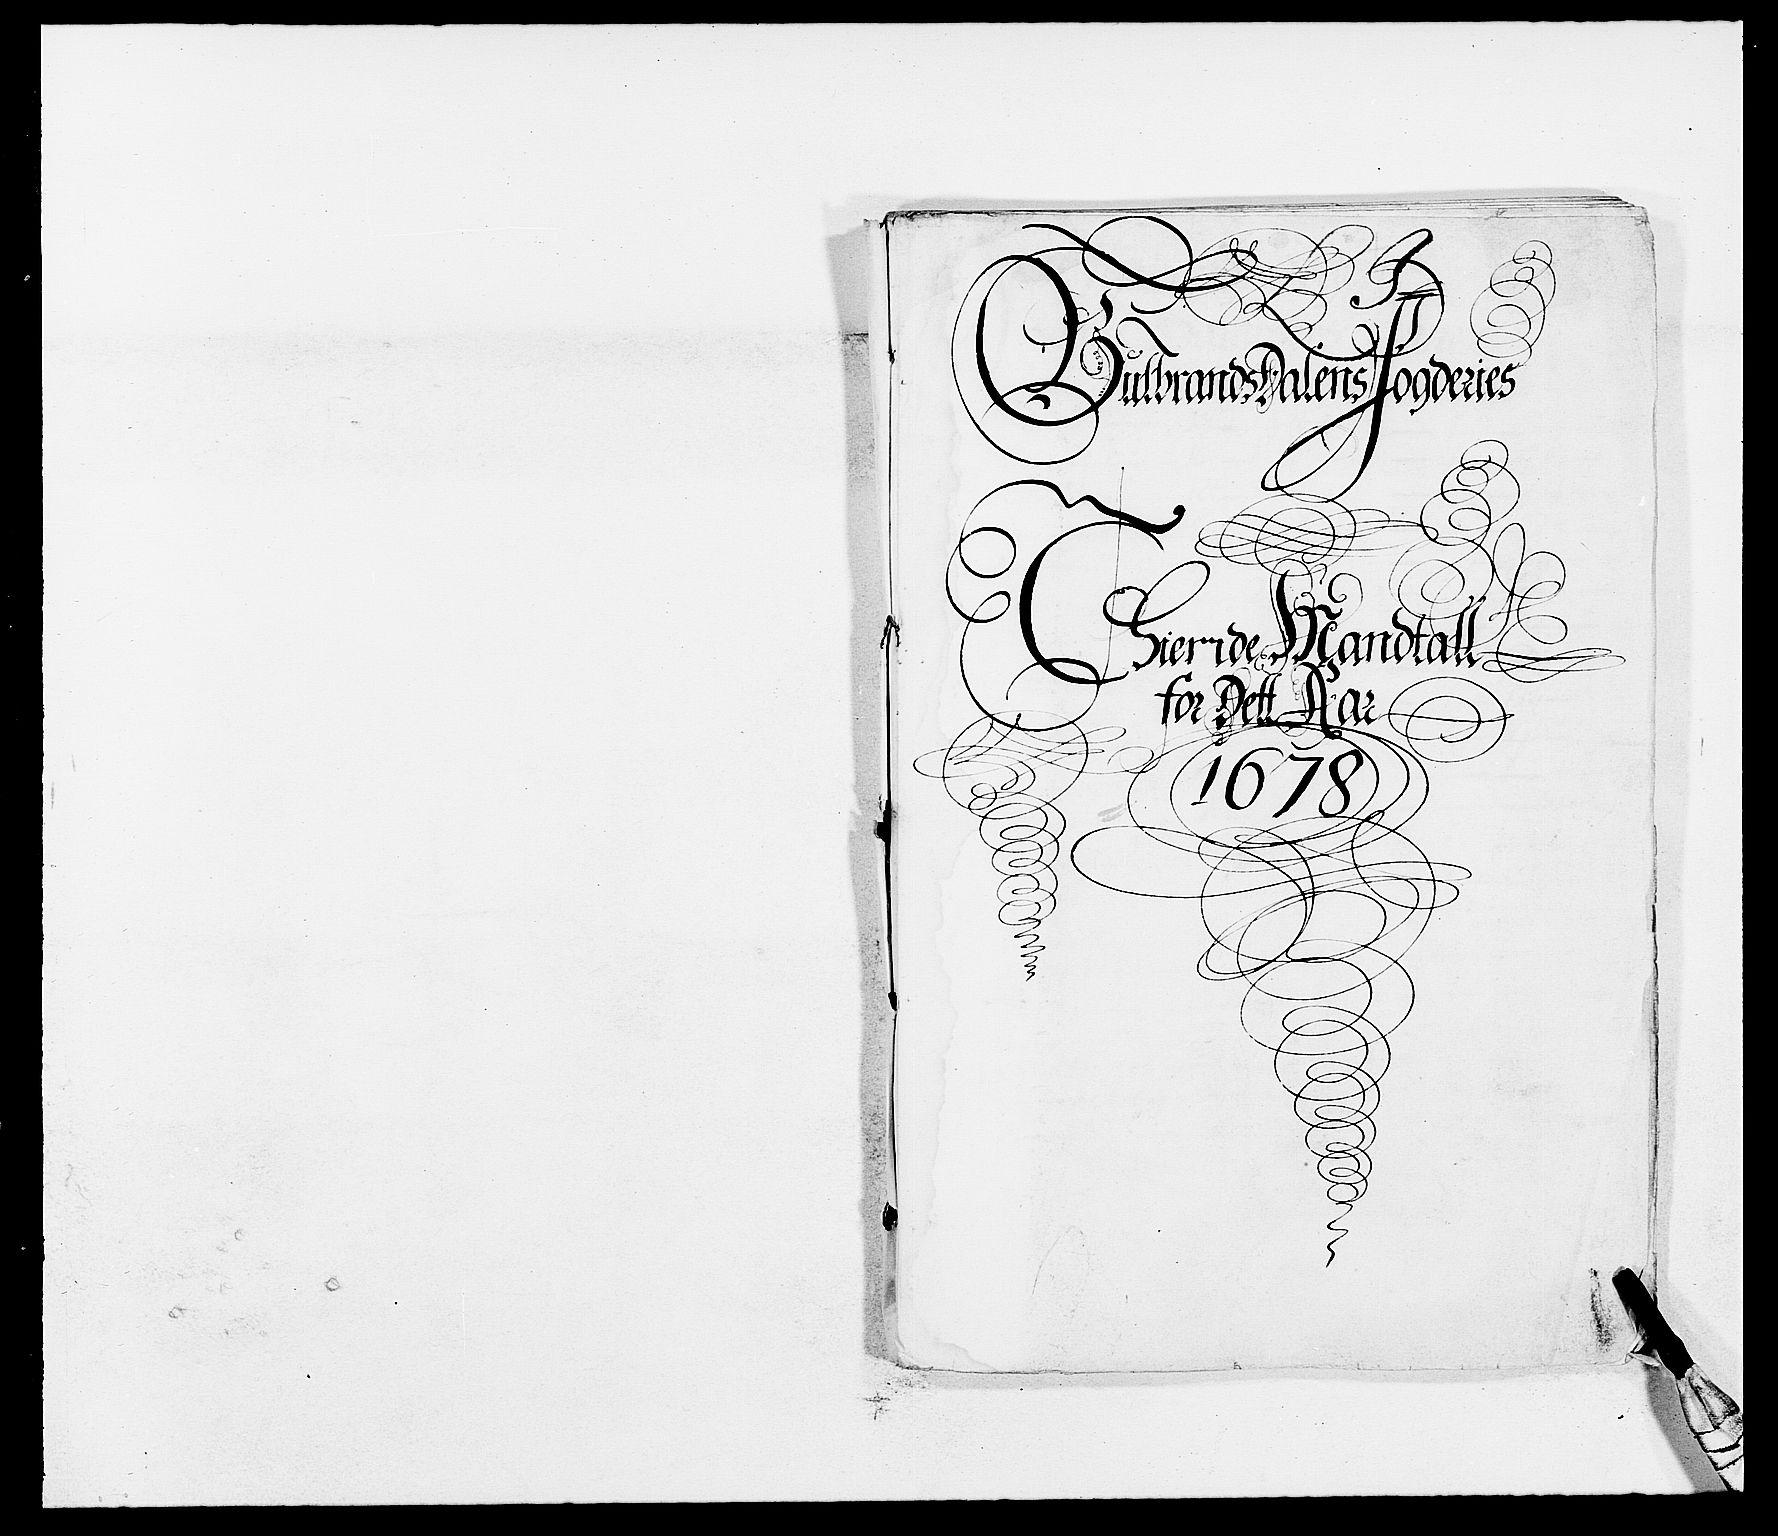 RA, Rentekammeret inntil 1814, Reviderte regnskaper, Fogderegnskap, R17/L1152: Fogderegnskap Gudbrandsdal, 1678-1679, s. 328